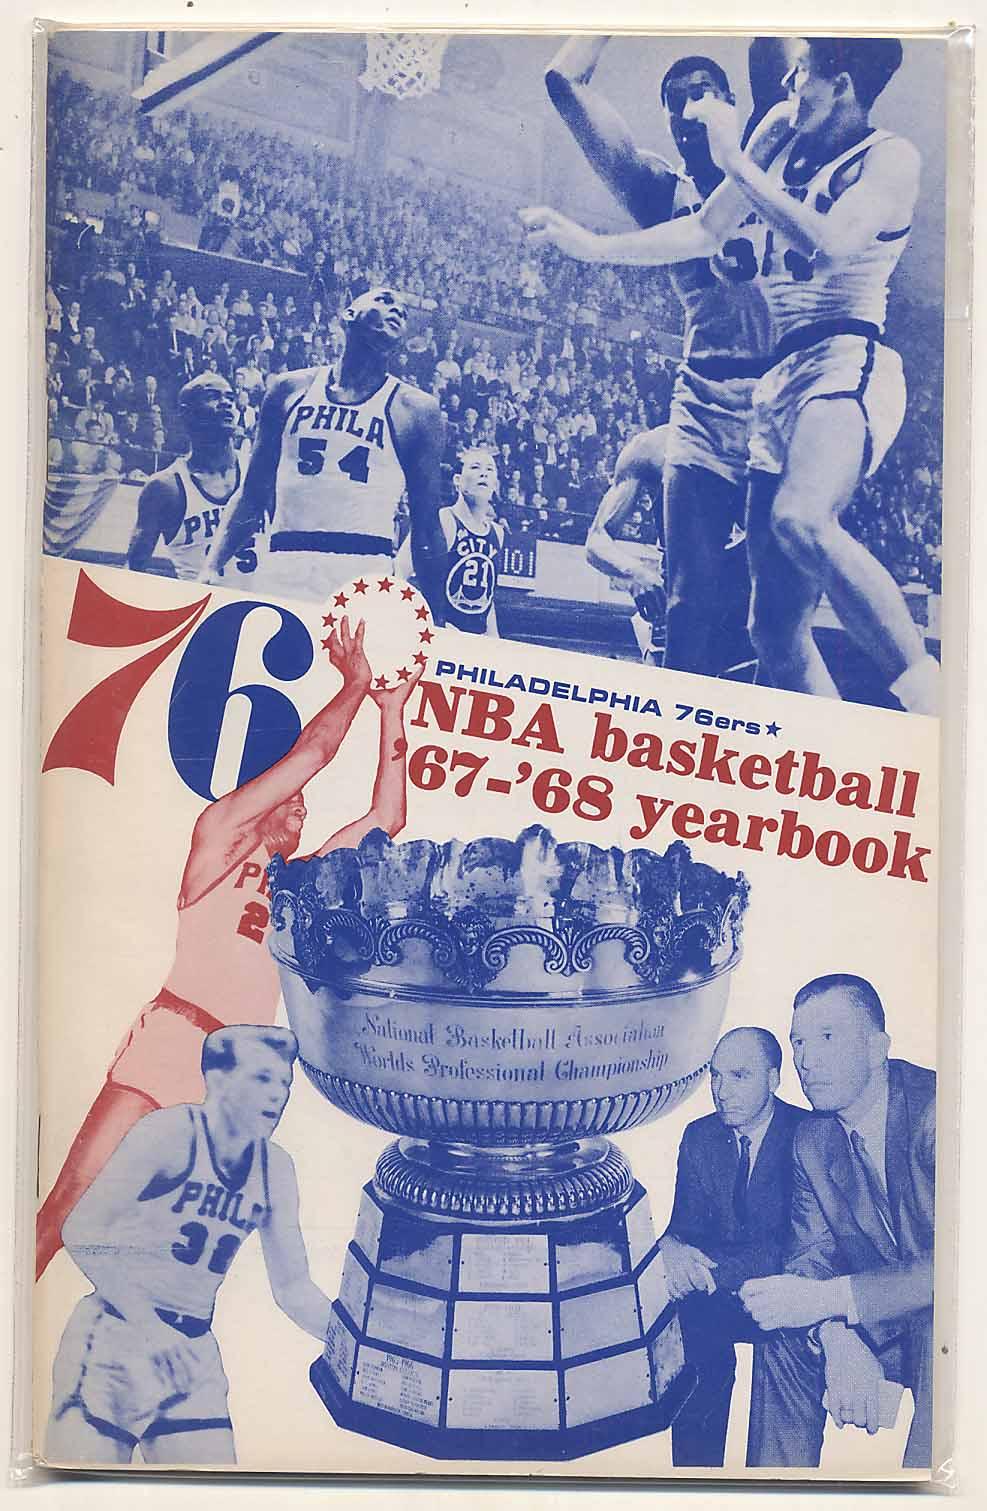 Lot #976 1967 Yearbook  Philadelphia 76ers Cond: Ex-Mt/NM